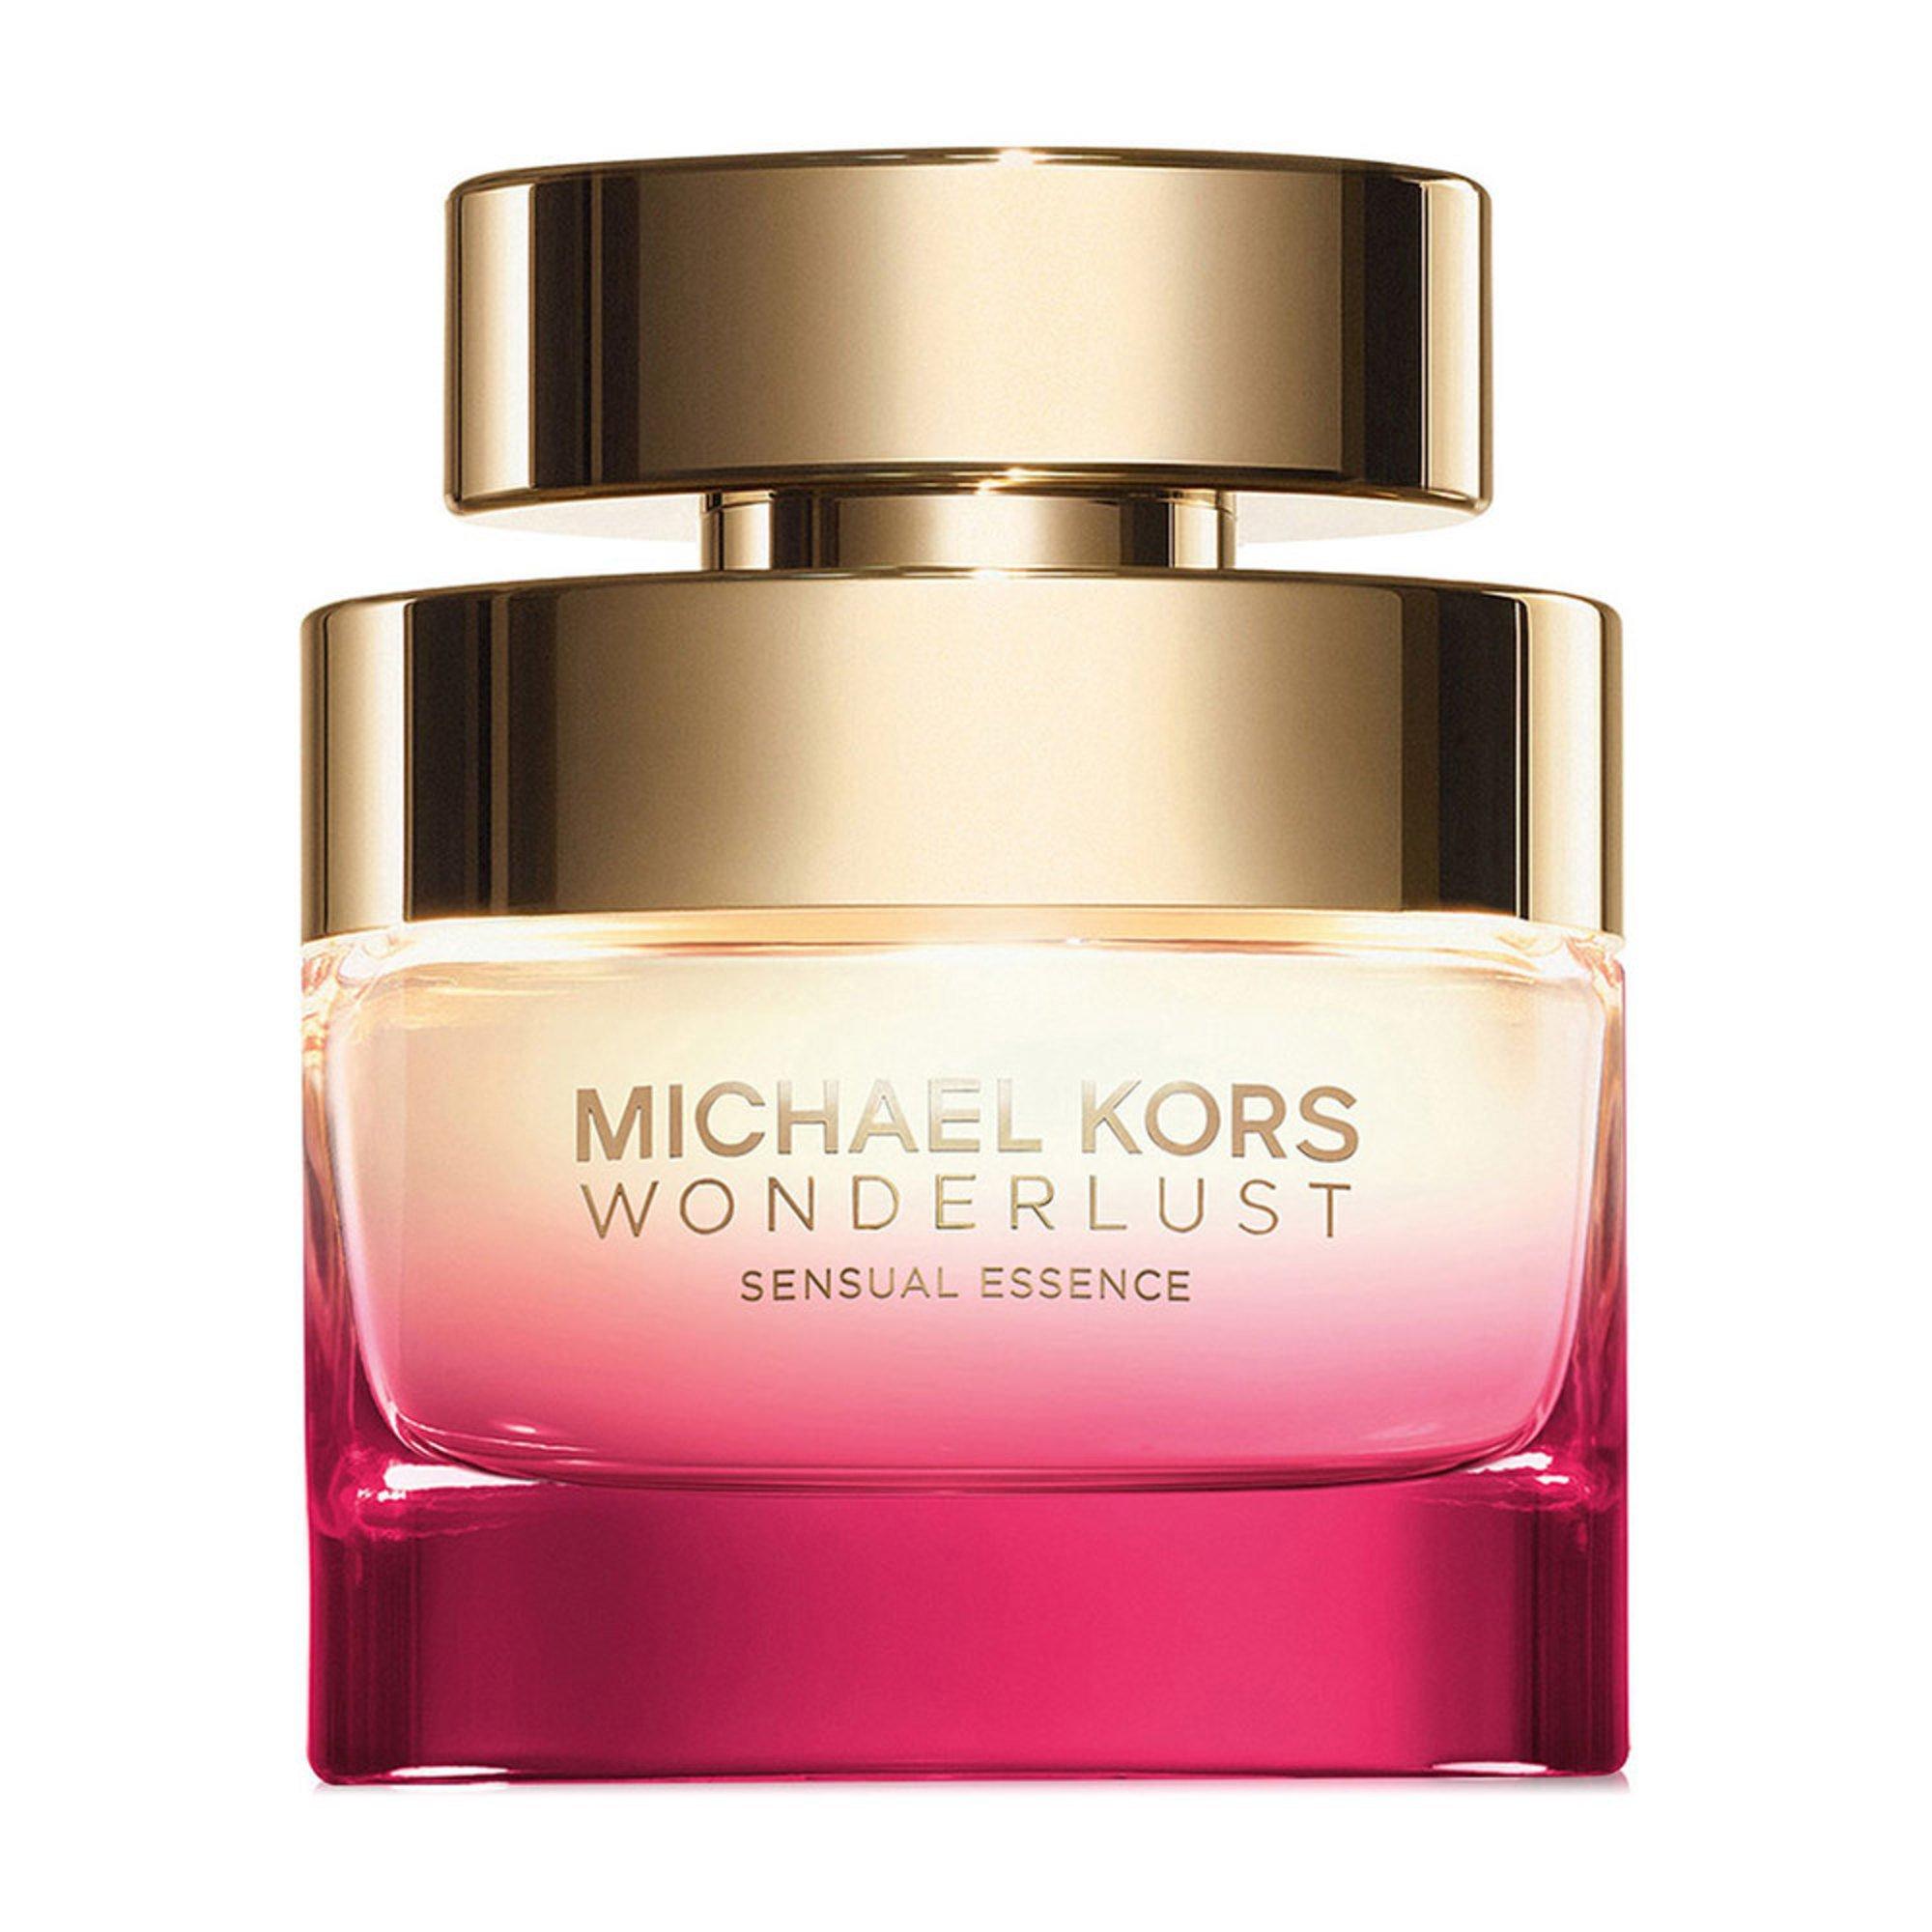 michael kors wonderlust sensual essence eau de parfum 1. Black Bedroom Furniture Sets. Home Design Ideas